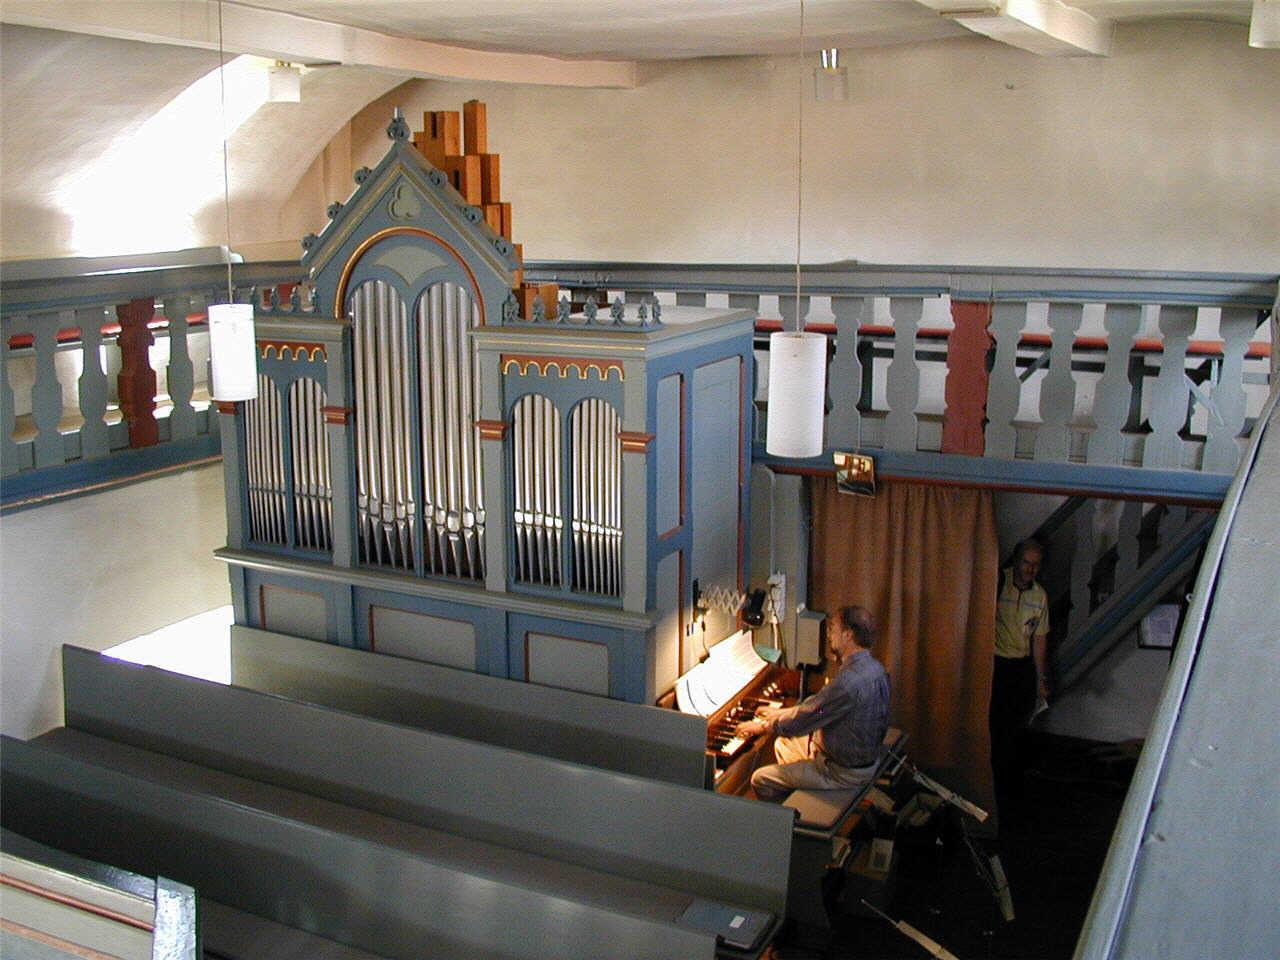 Orgel der Petri Kirche. (© Detlef Battefeld)